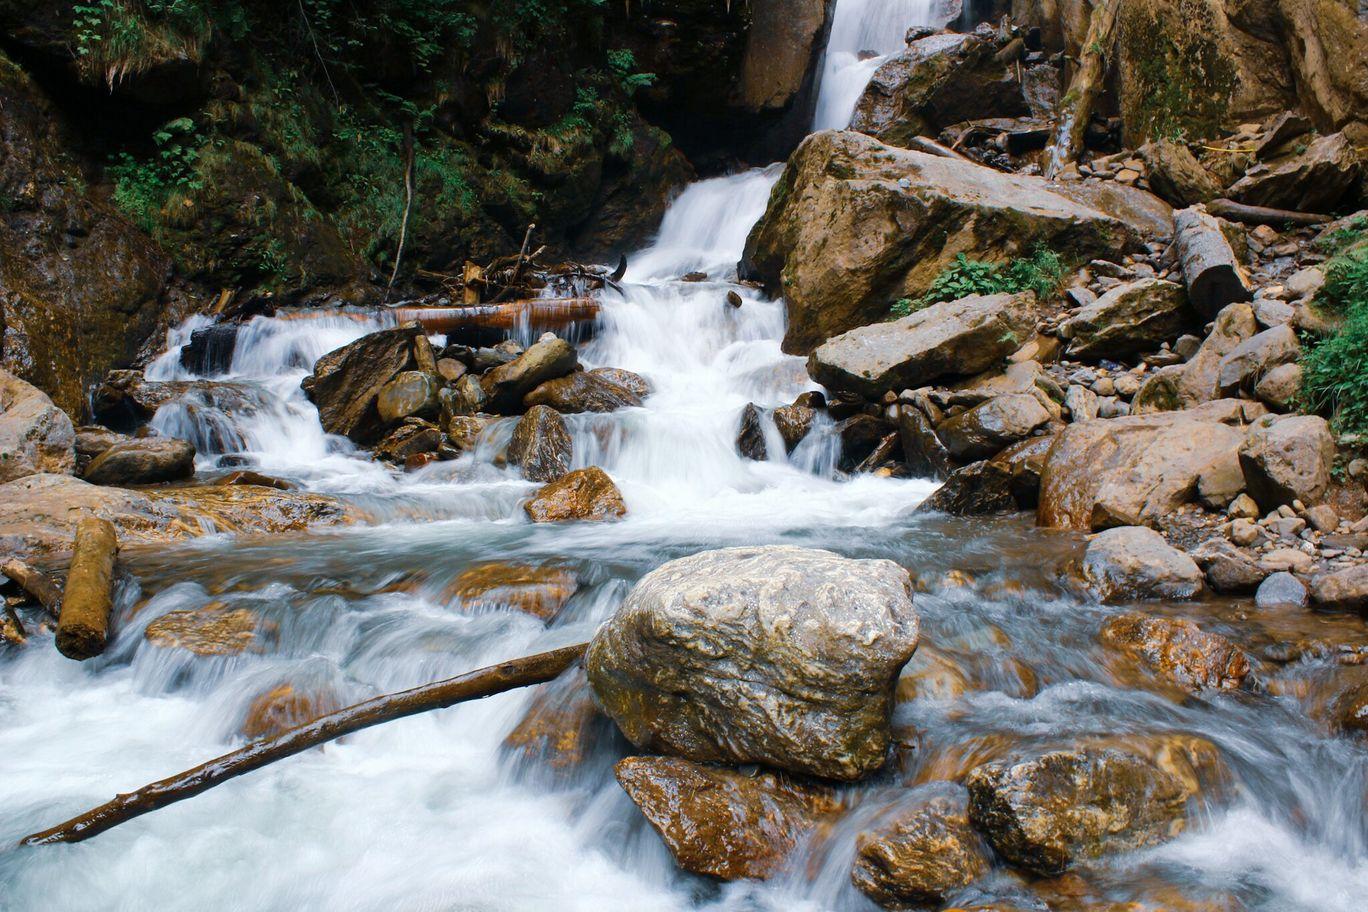 Photo of KheerGanga Waterfall - Half way By Salil Sharma